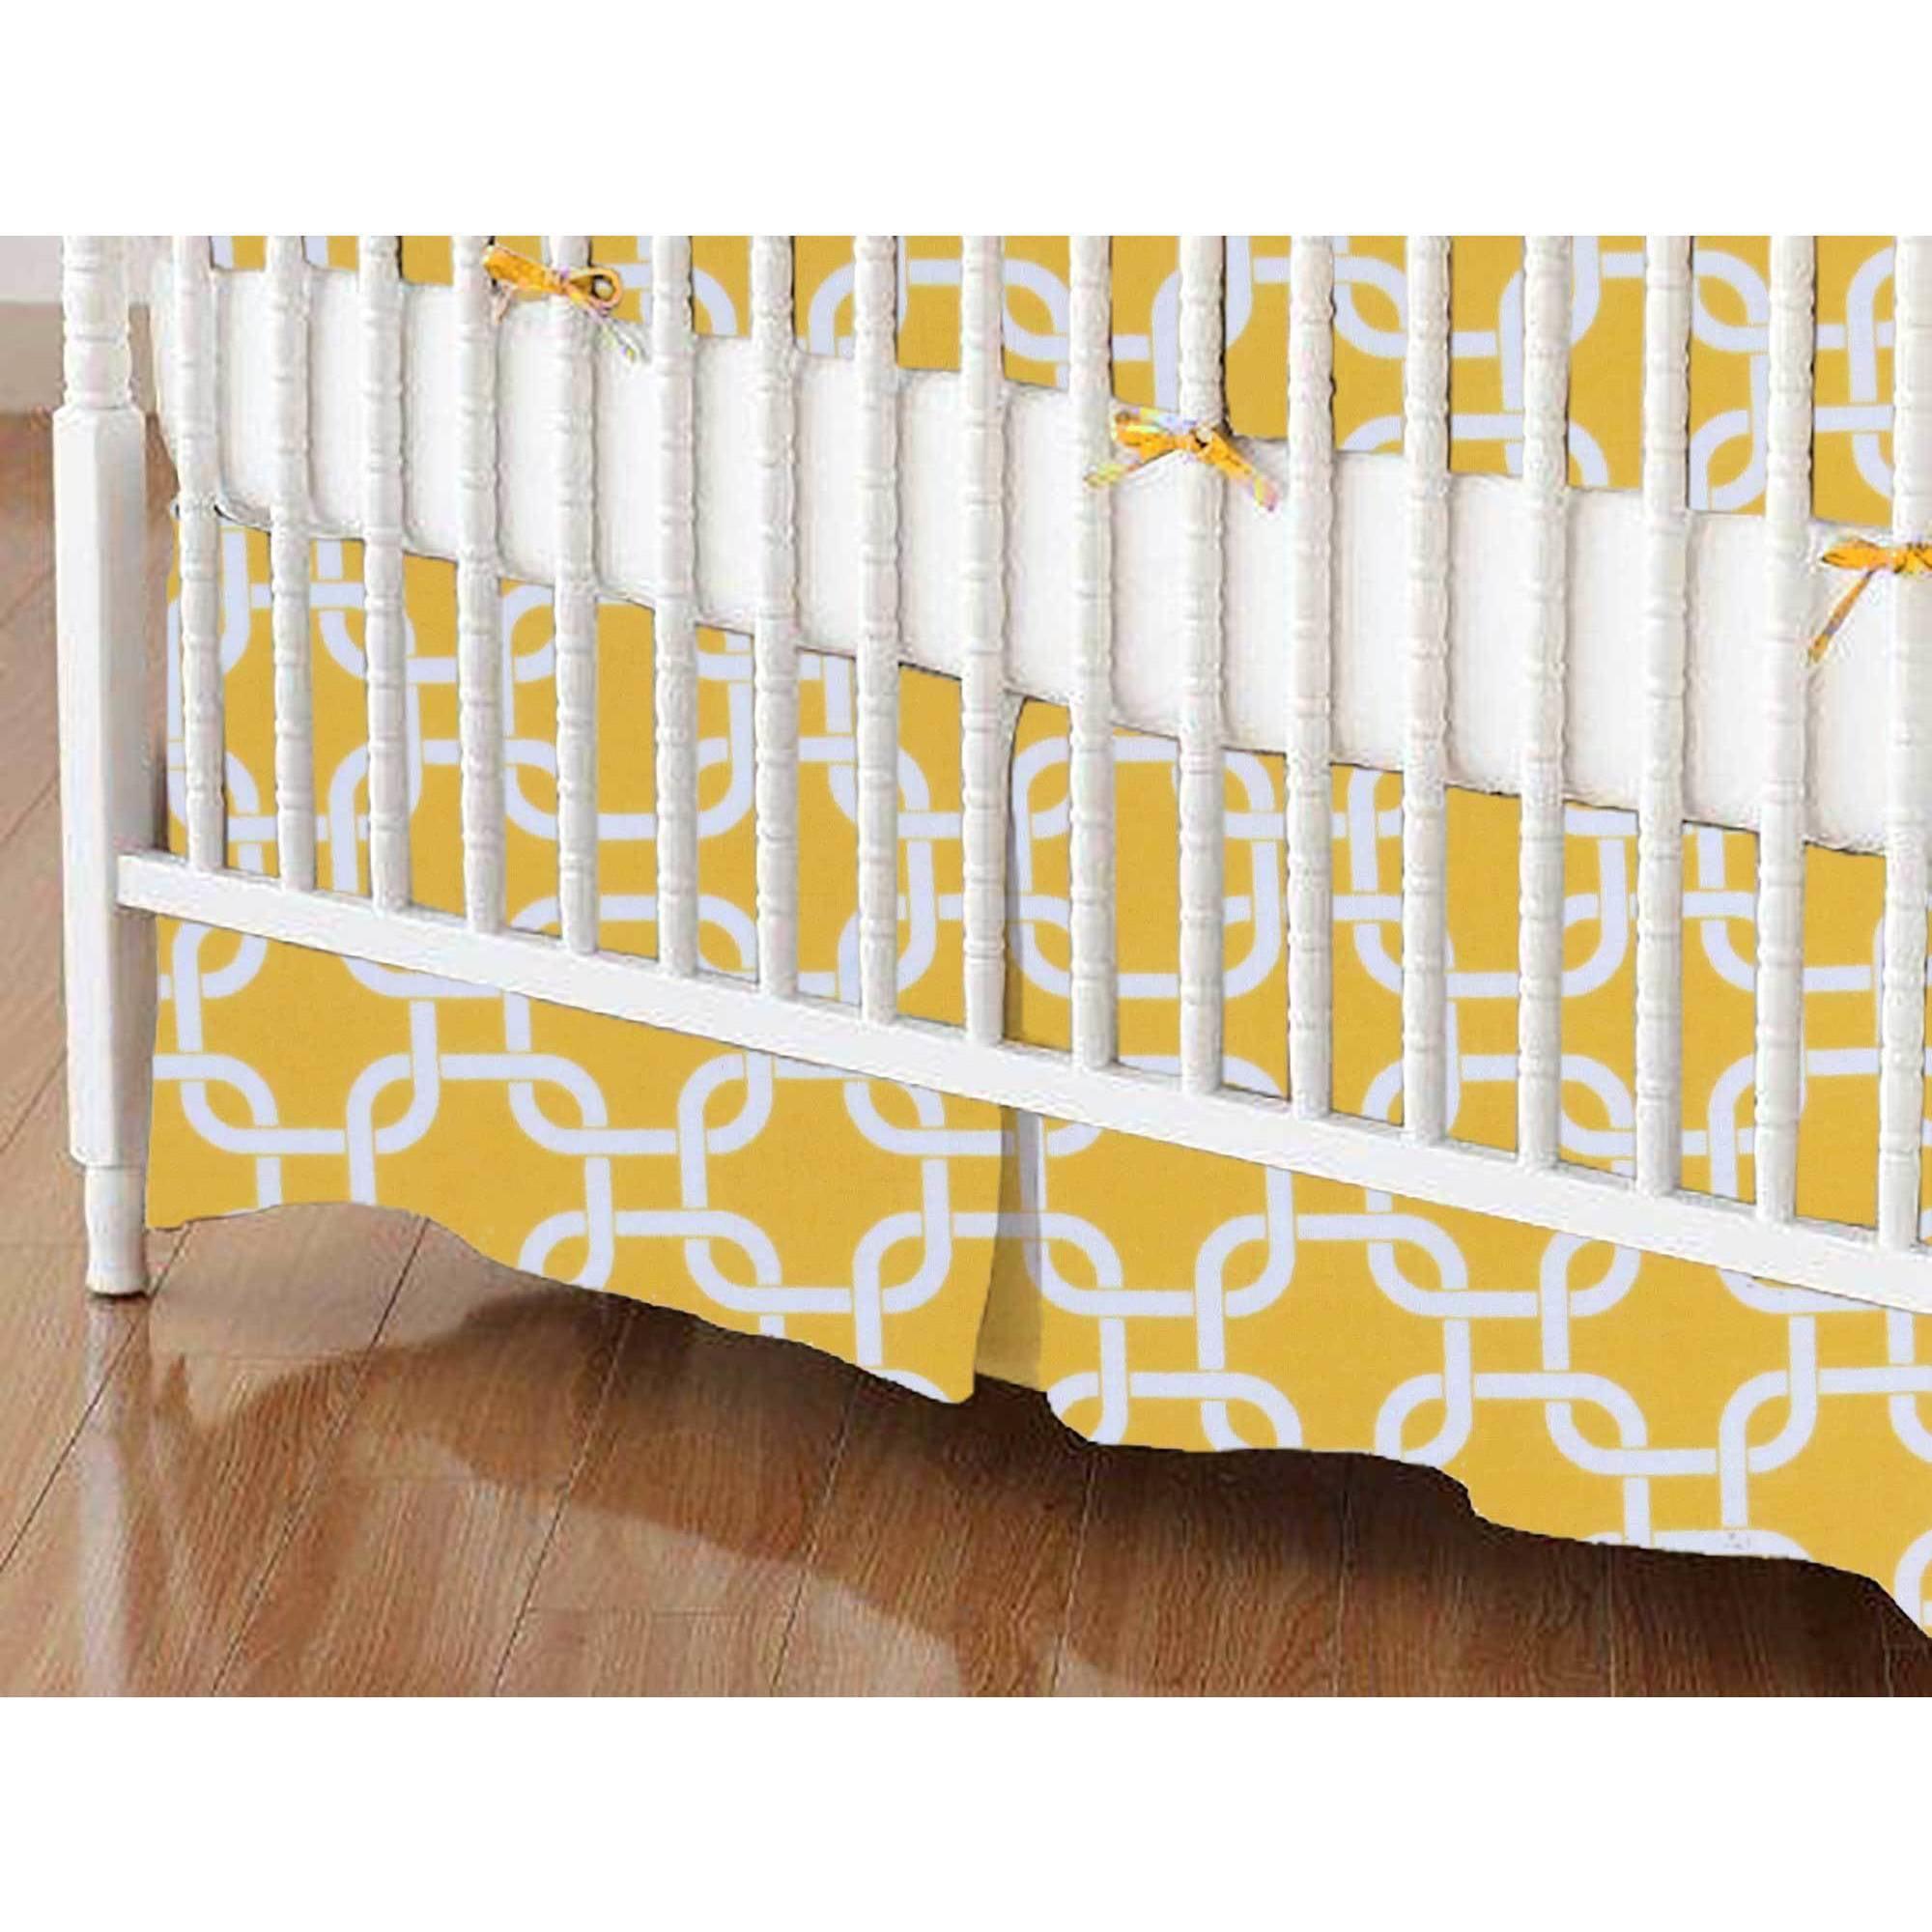 SheetWorld Crib Skirt - Lemon Yellow Links